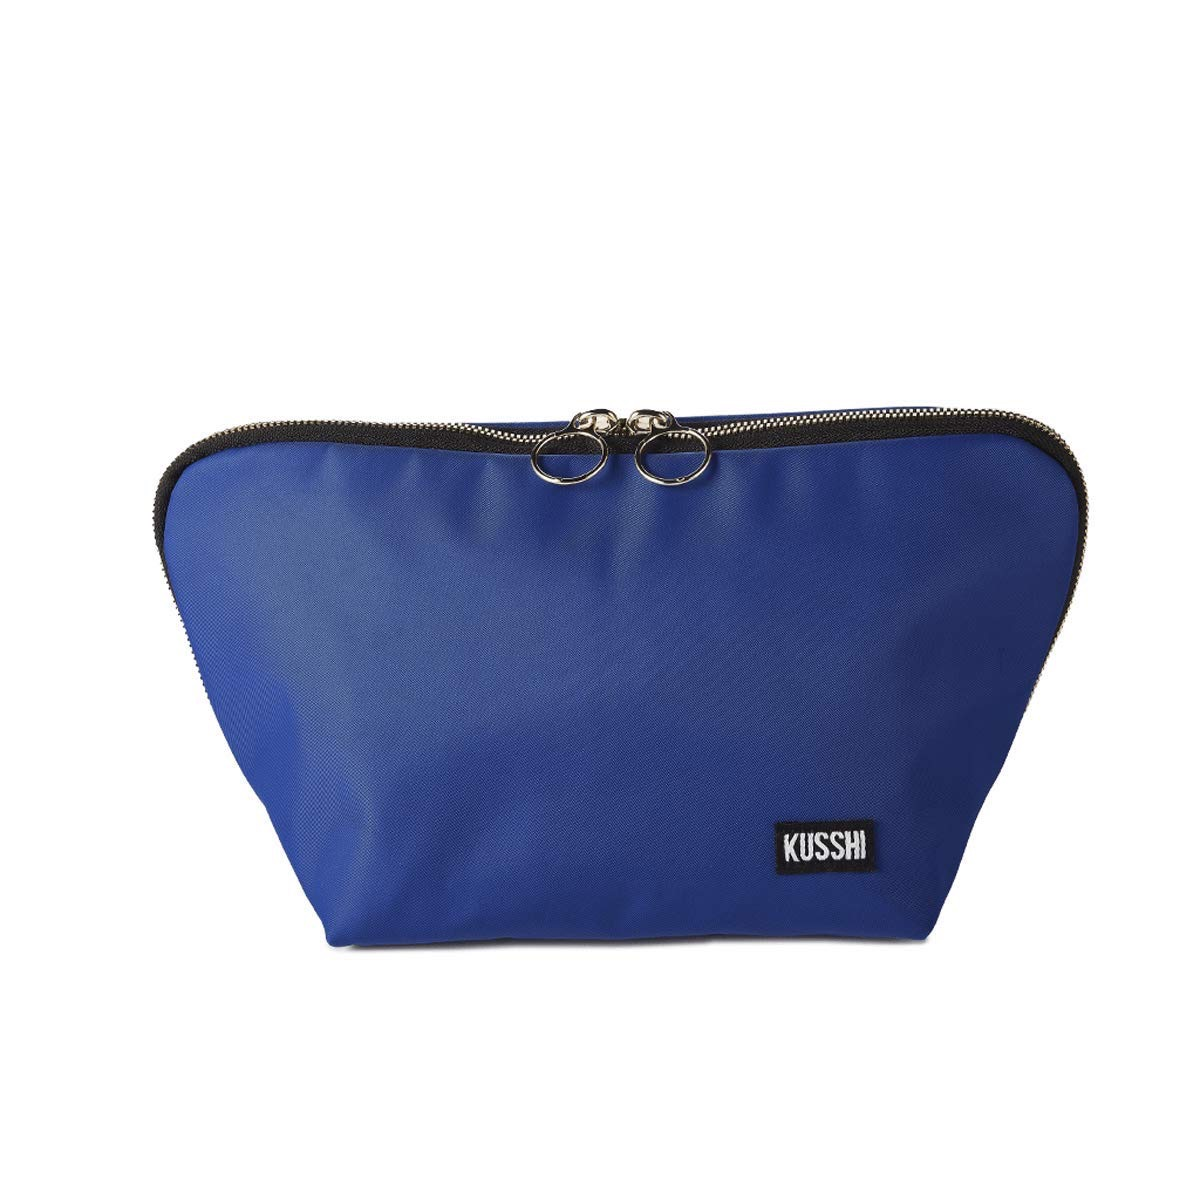 kushi blue travel makeup bag